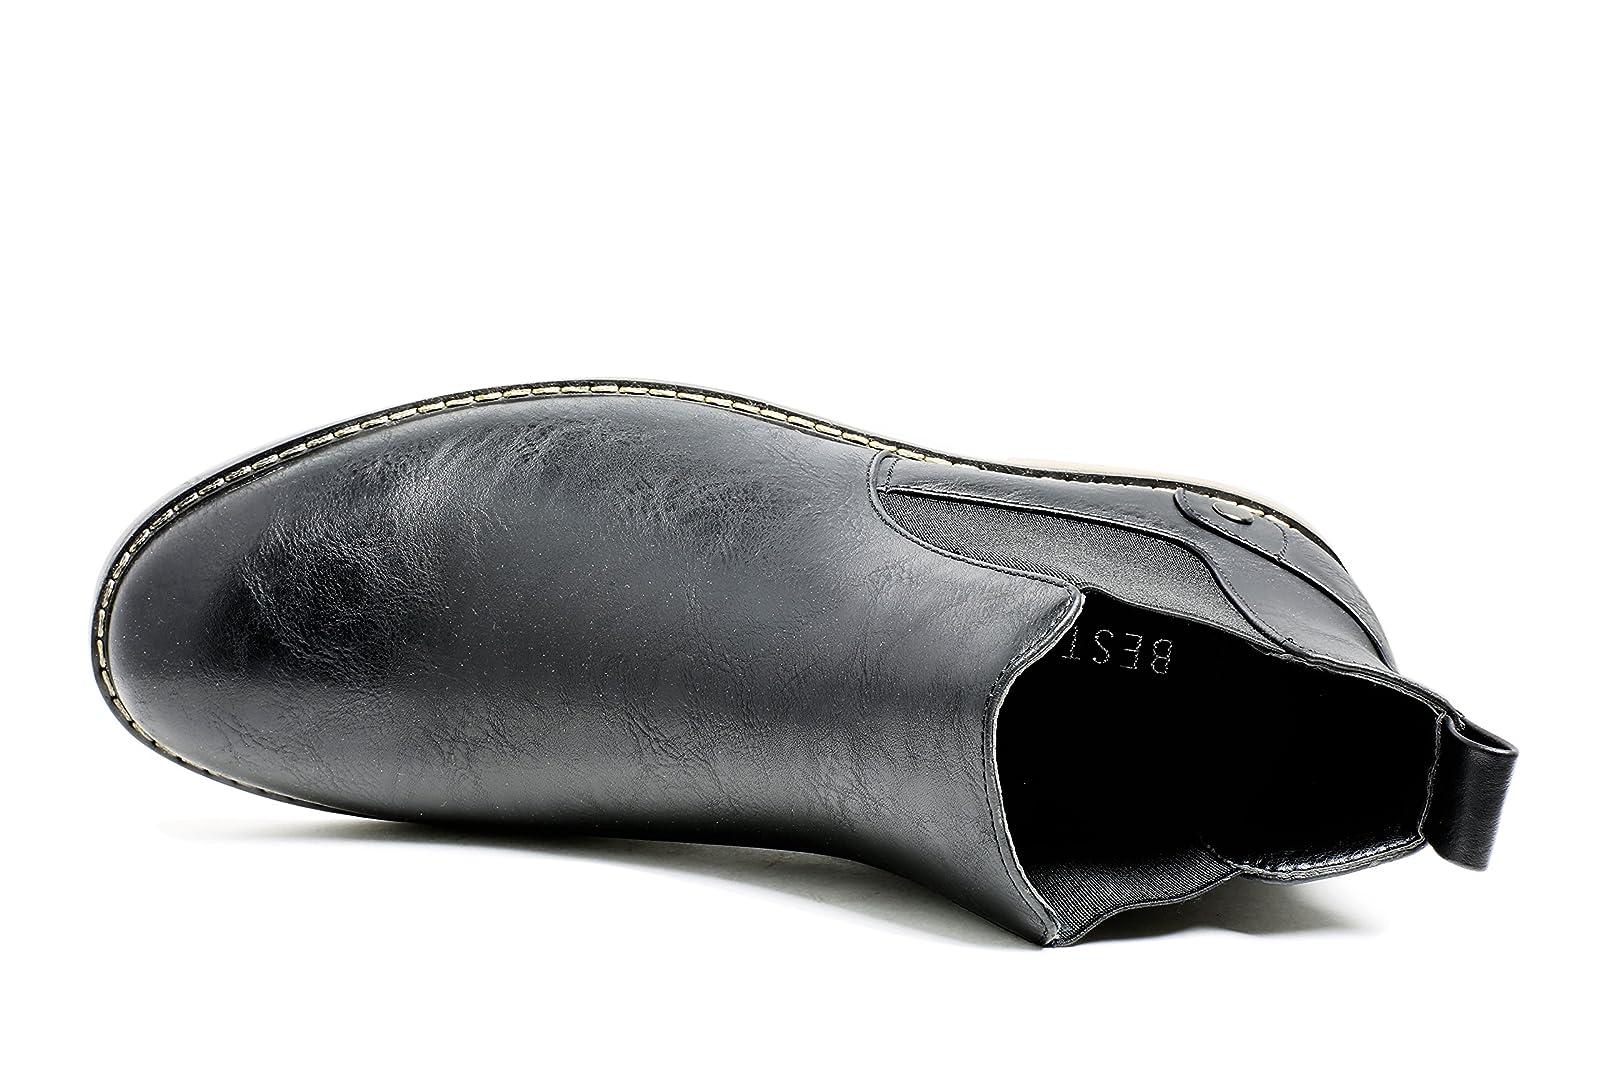 PartyEight Mens Ankle Casual Chelsea Boots Medium (D, M) US Men - 1